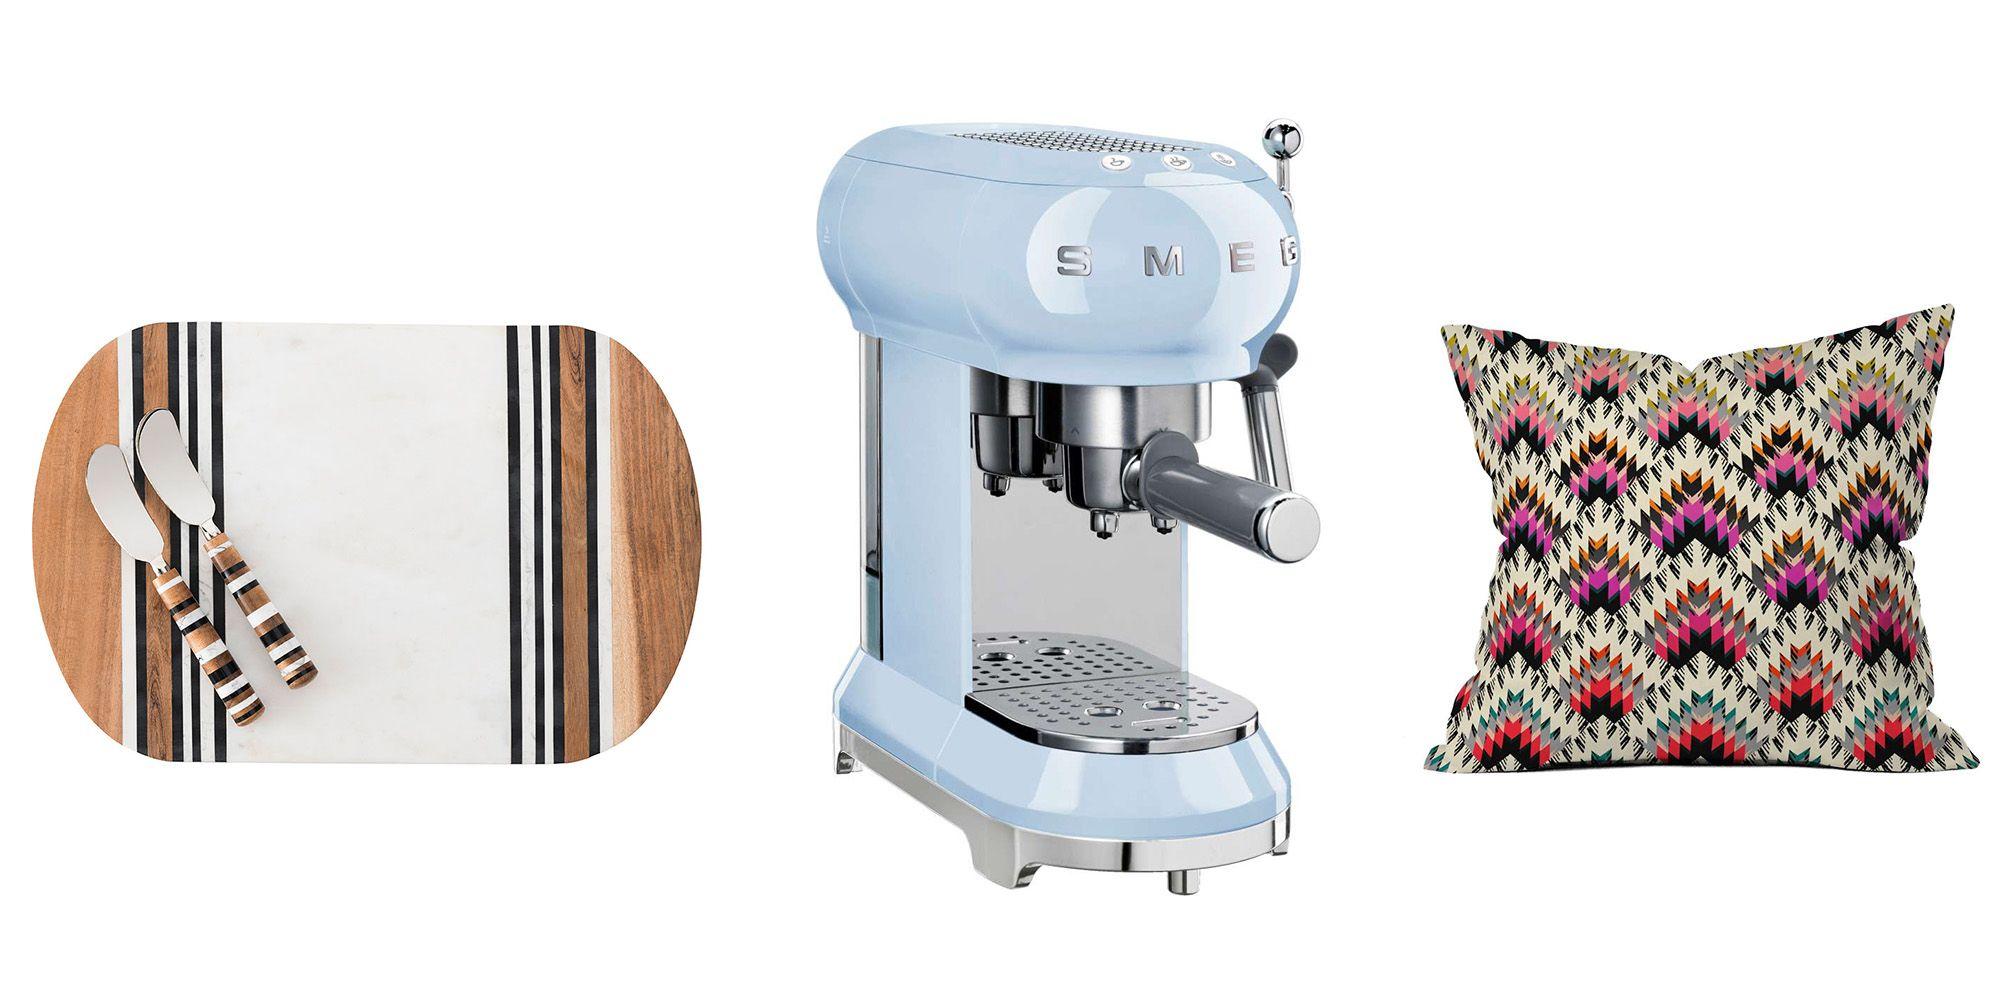 20 Best Housewarming Gifts - Unique Ideas for Good Housewarming Presents